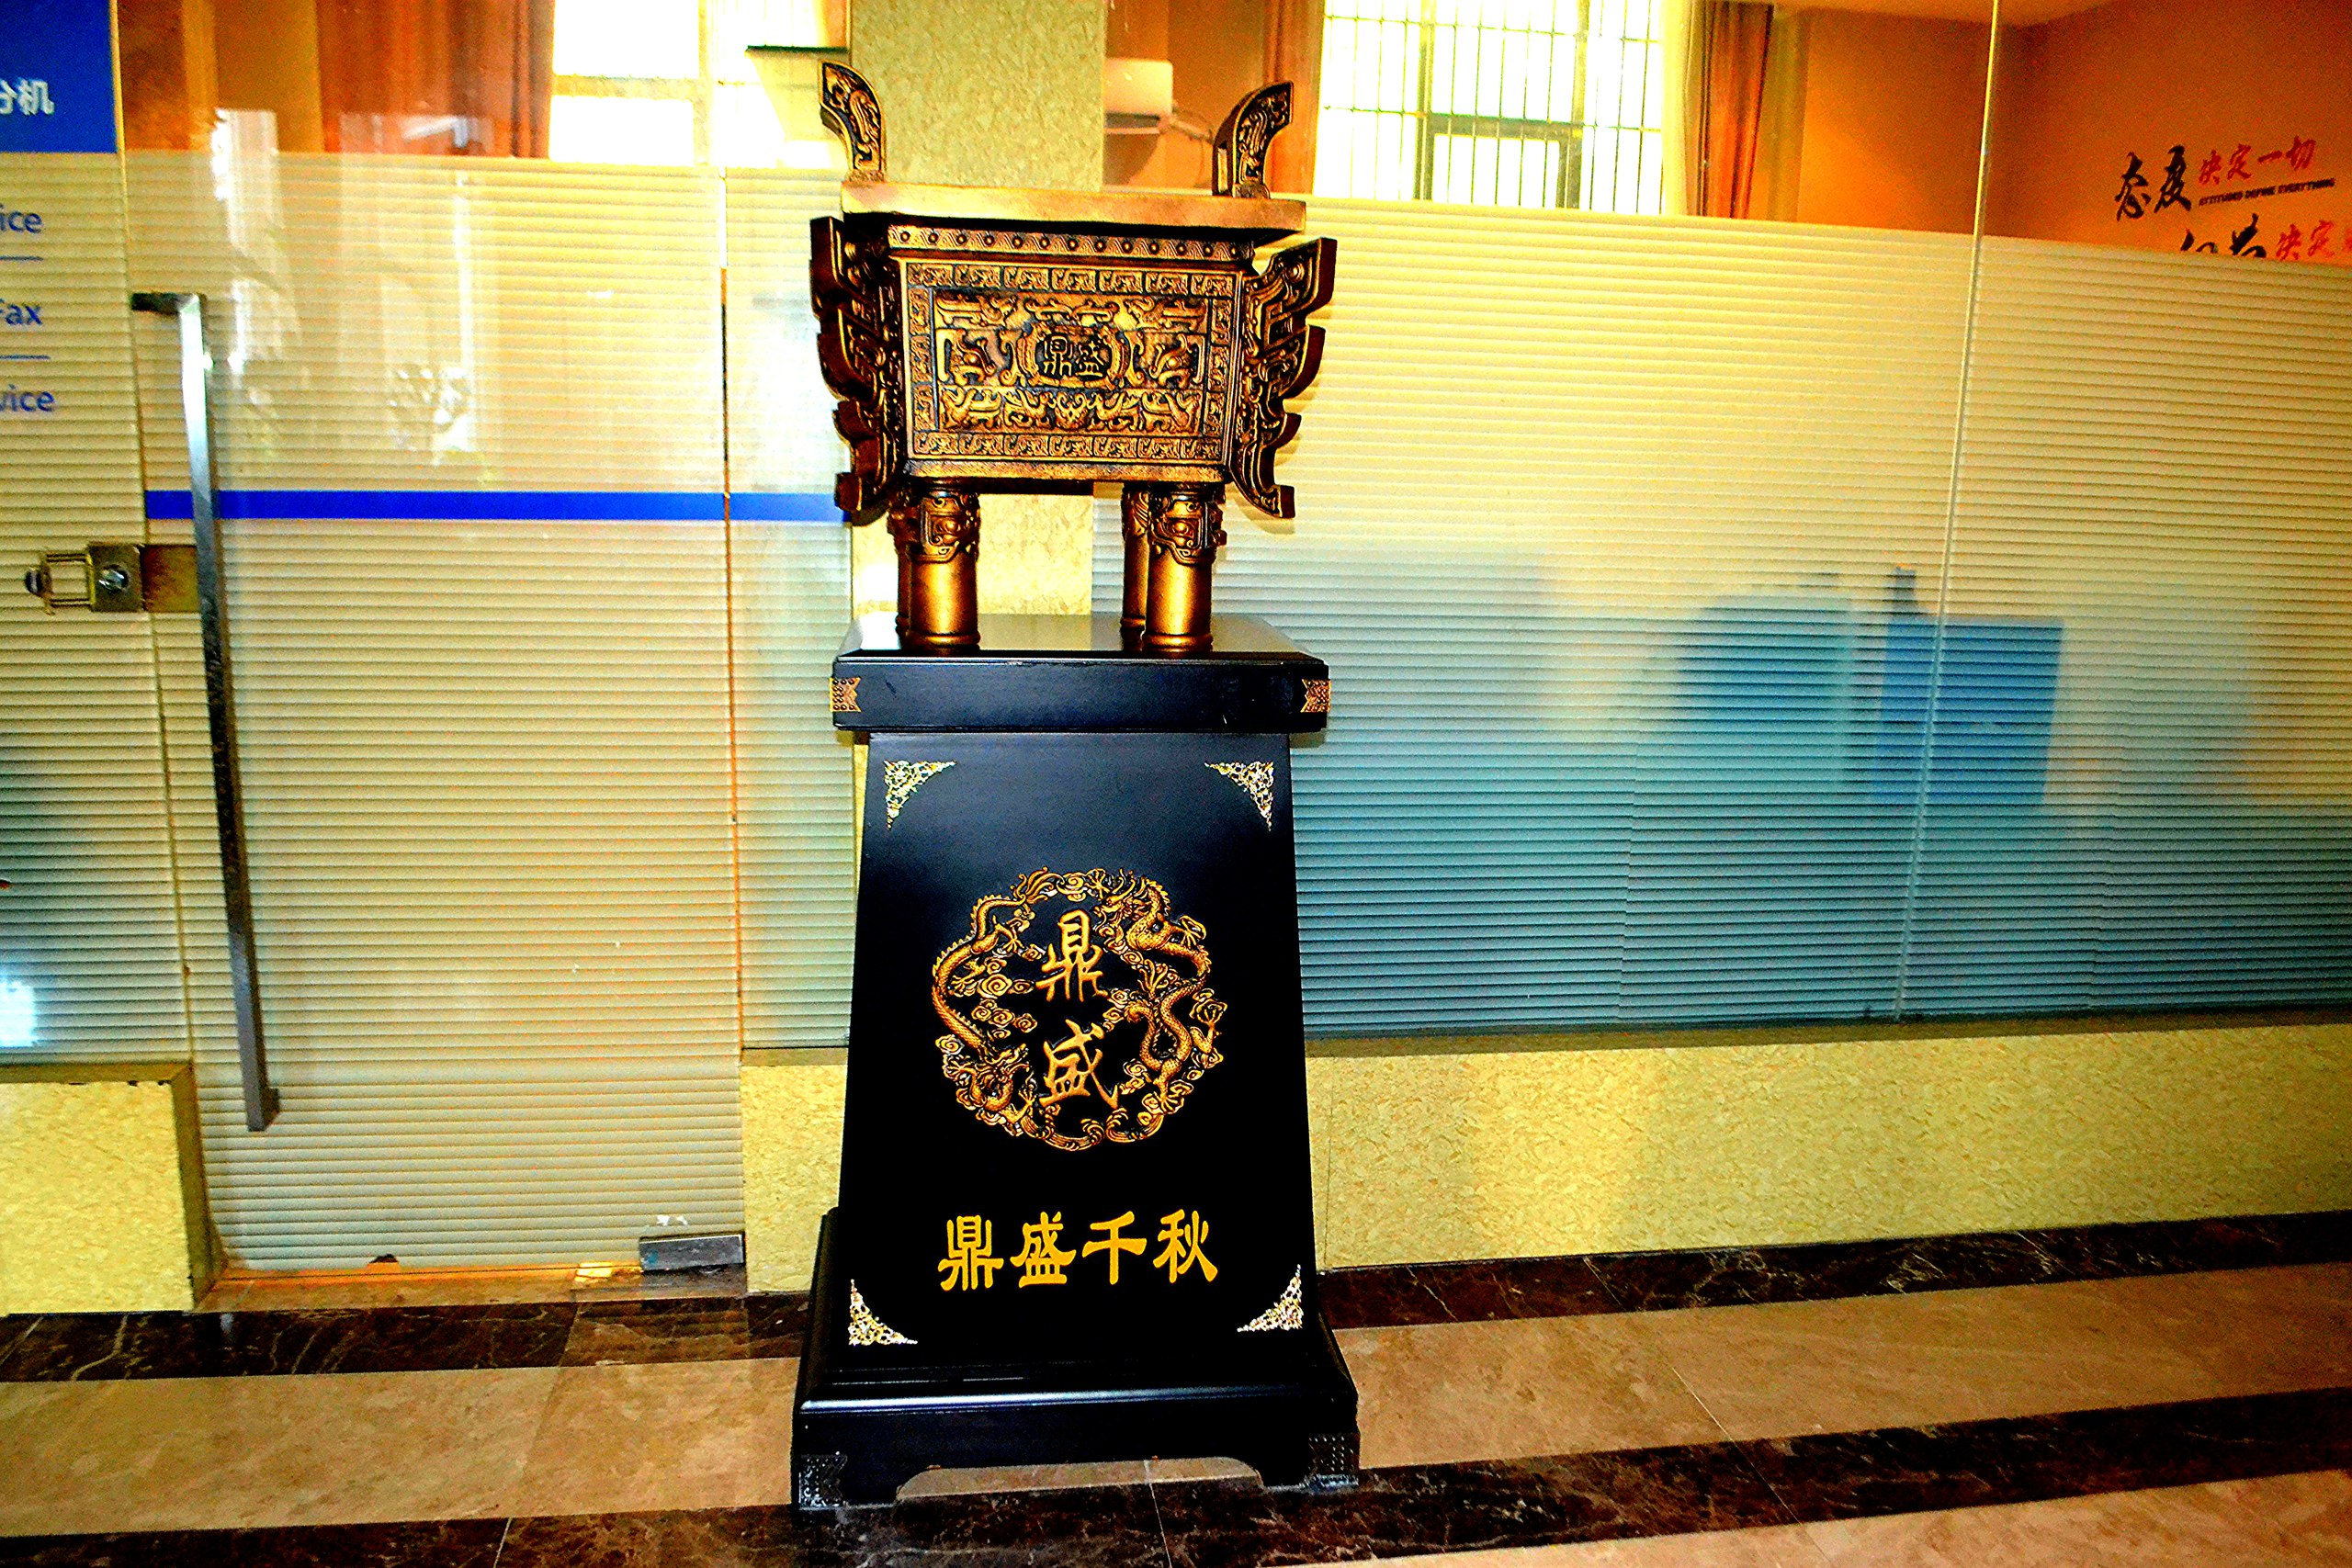 Елена Руденко (Валтея). Китай, о.Хайнань, г.Санья. (фото) KVrE5Gbm-Q8